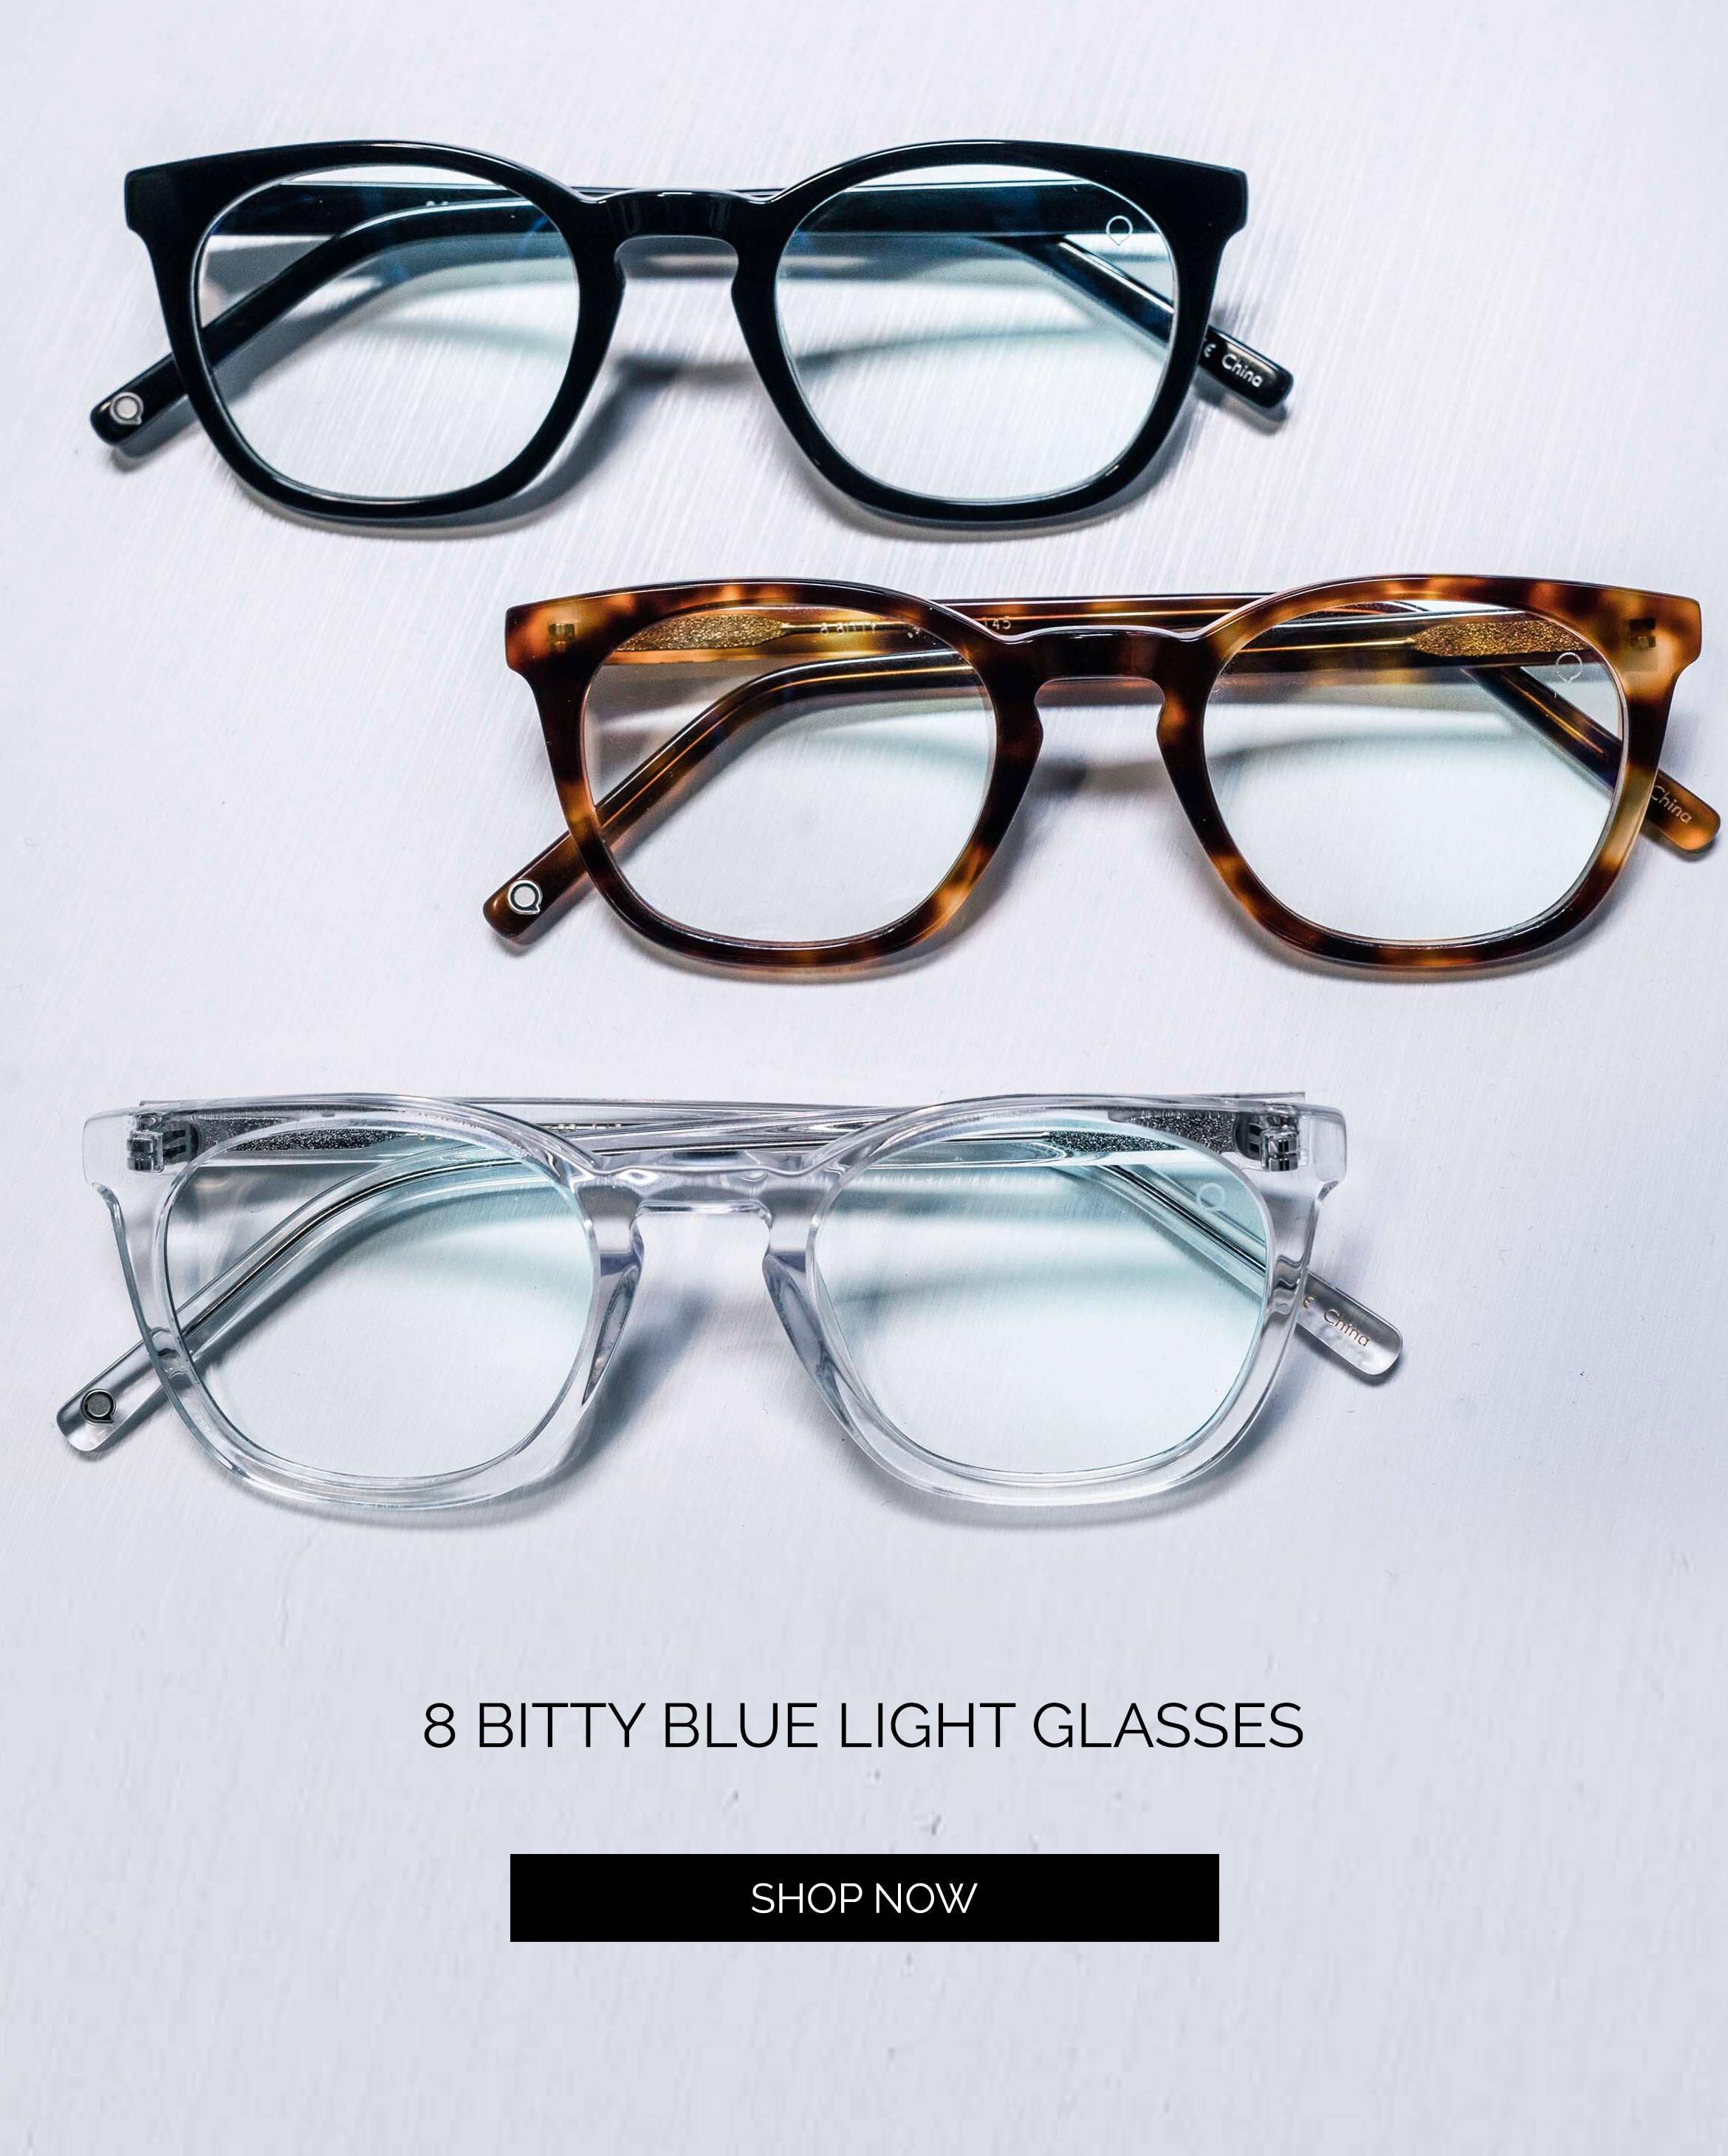 8 Bitty Blue Light Glasses